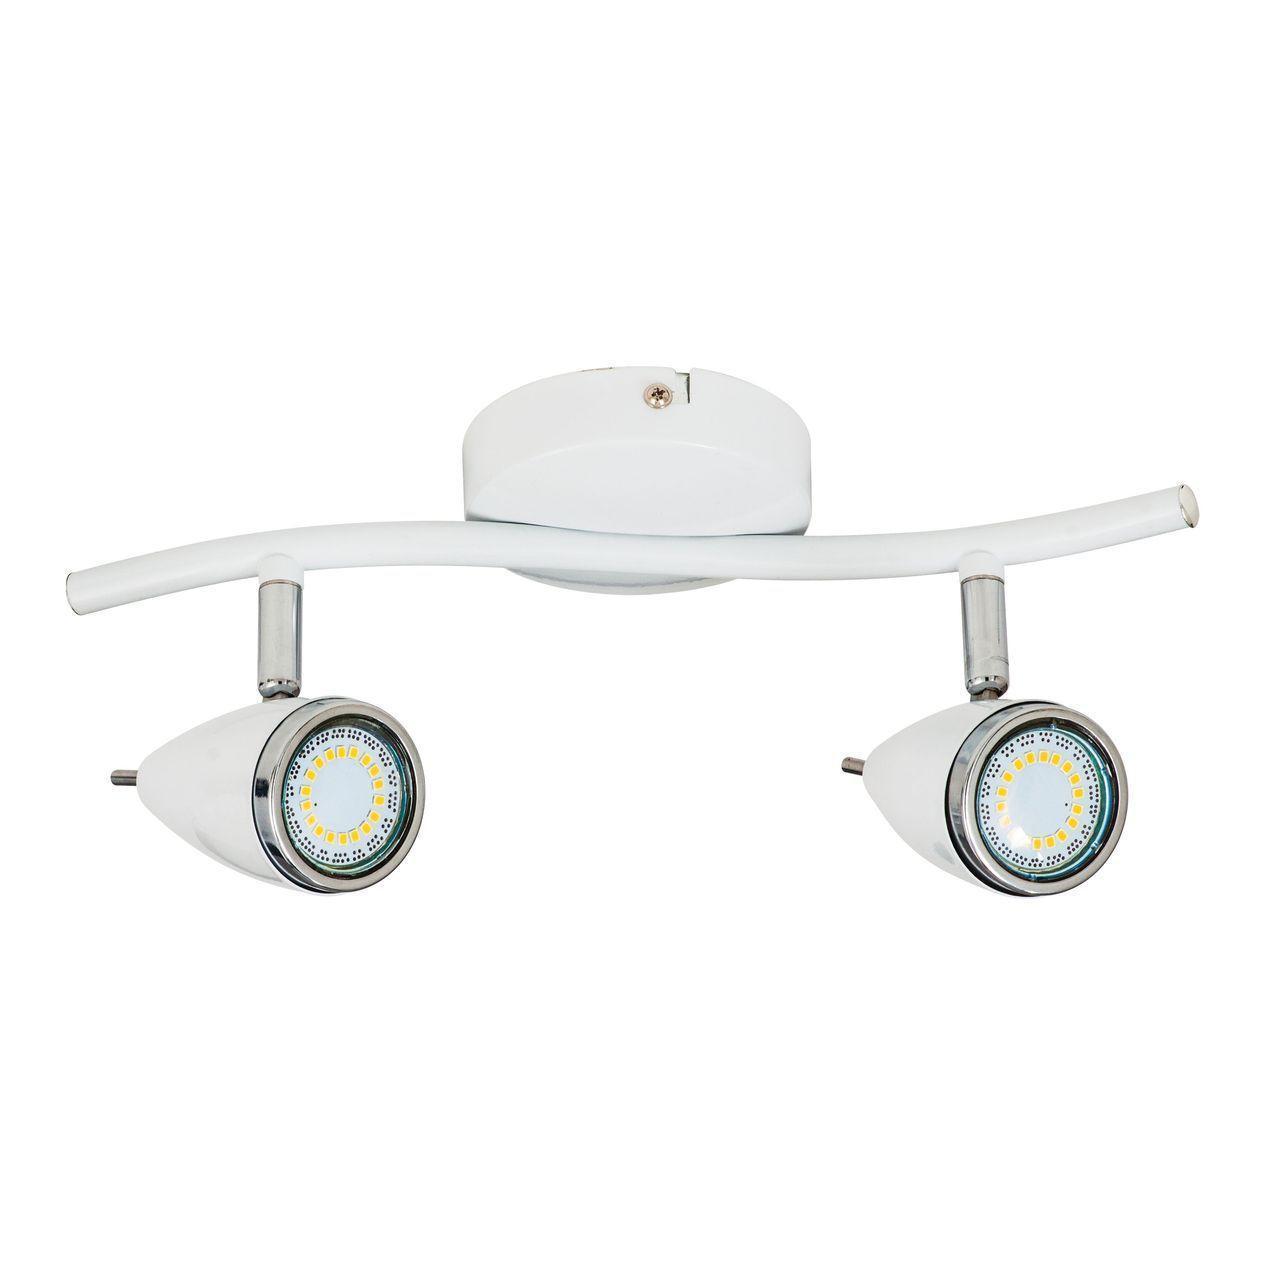 Спот Spot Light Linda 2098202 светильник спот spot light classic wood oak 2998170